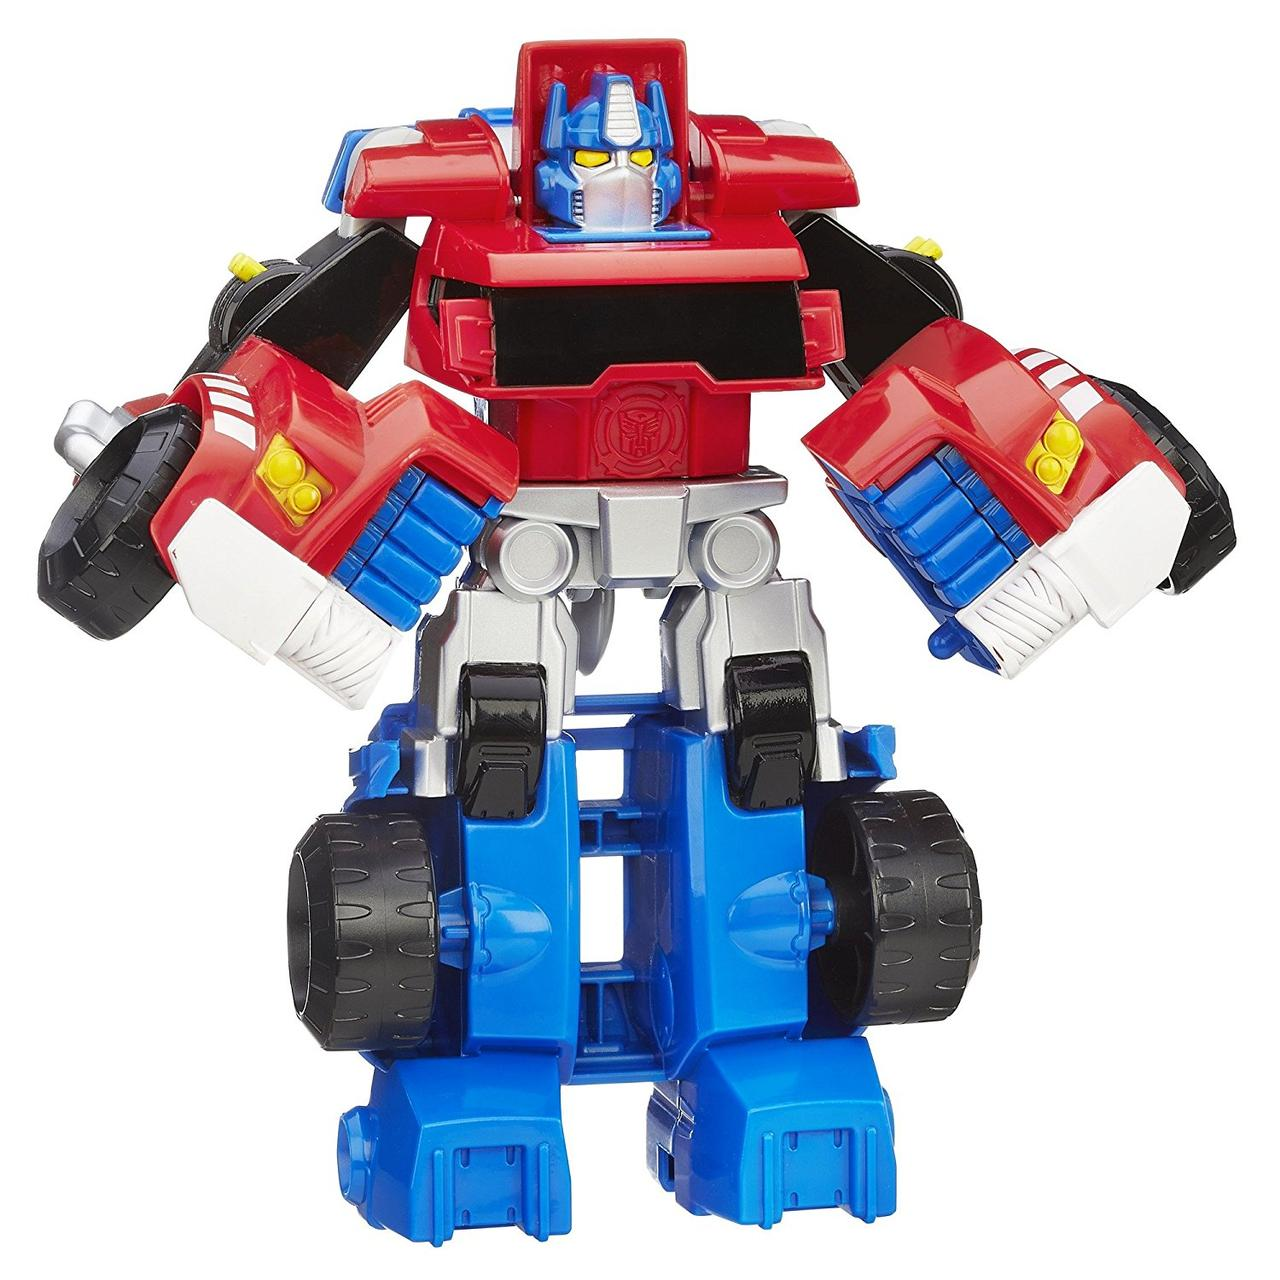 Трансформер Боты Спасатели Оптимус Прайм Playskool Heroes Transformers Rescue Bots Optimus Prime Exclusive Fig